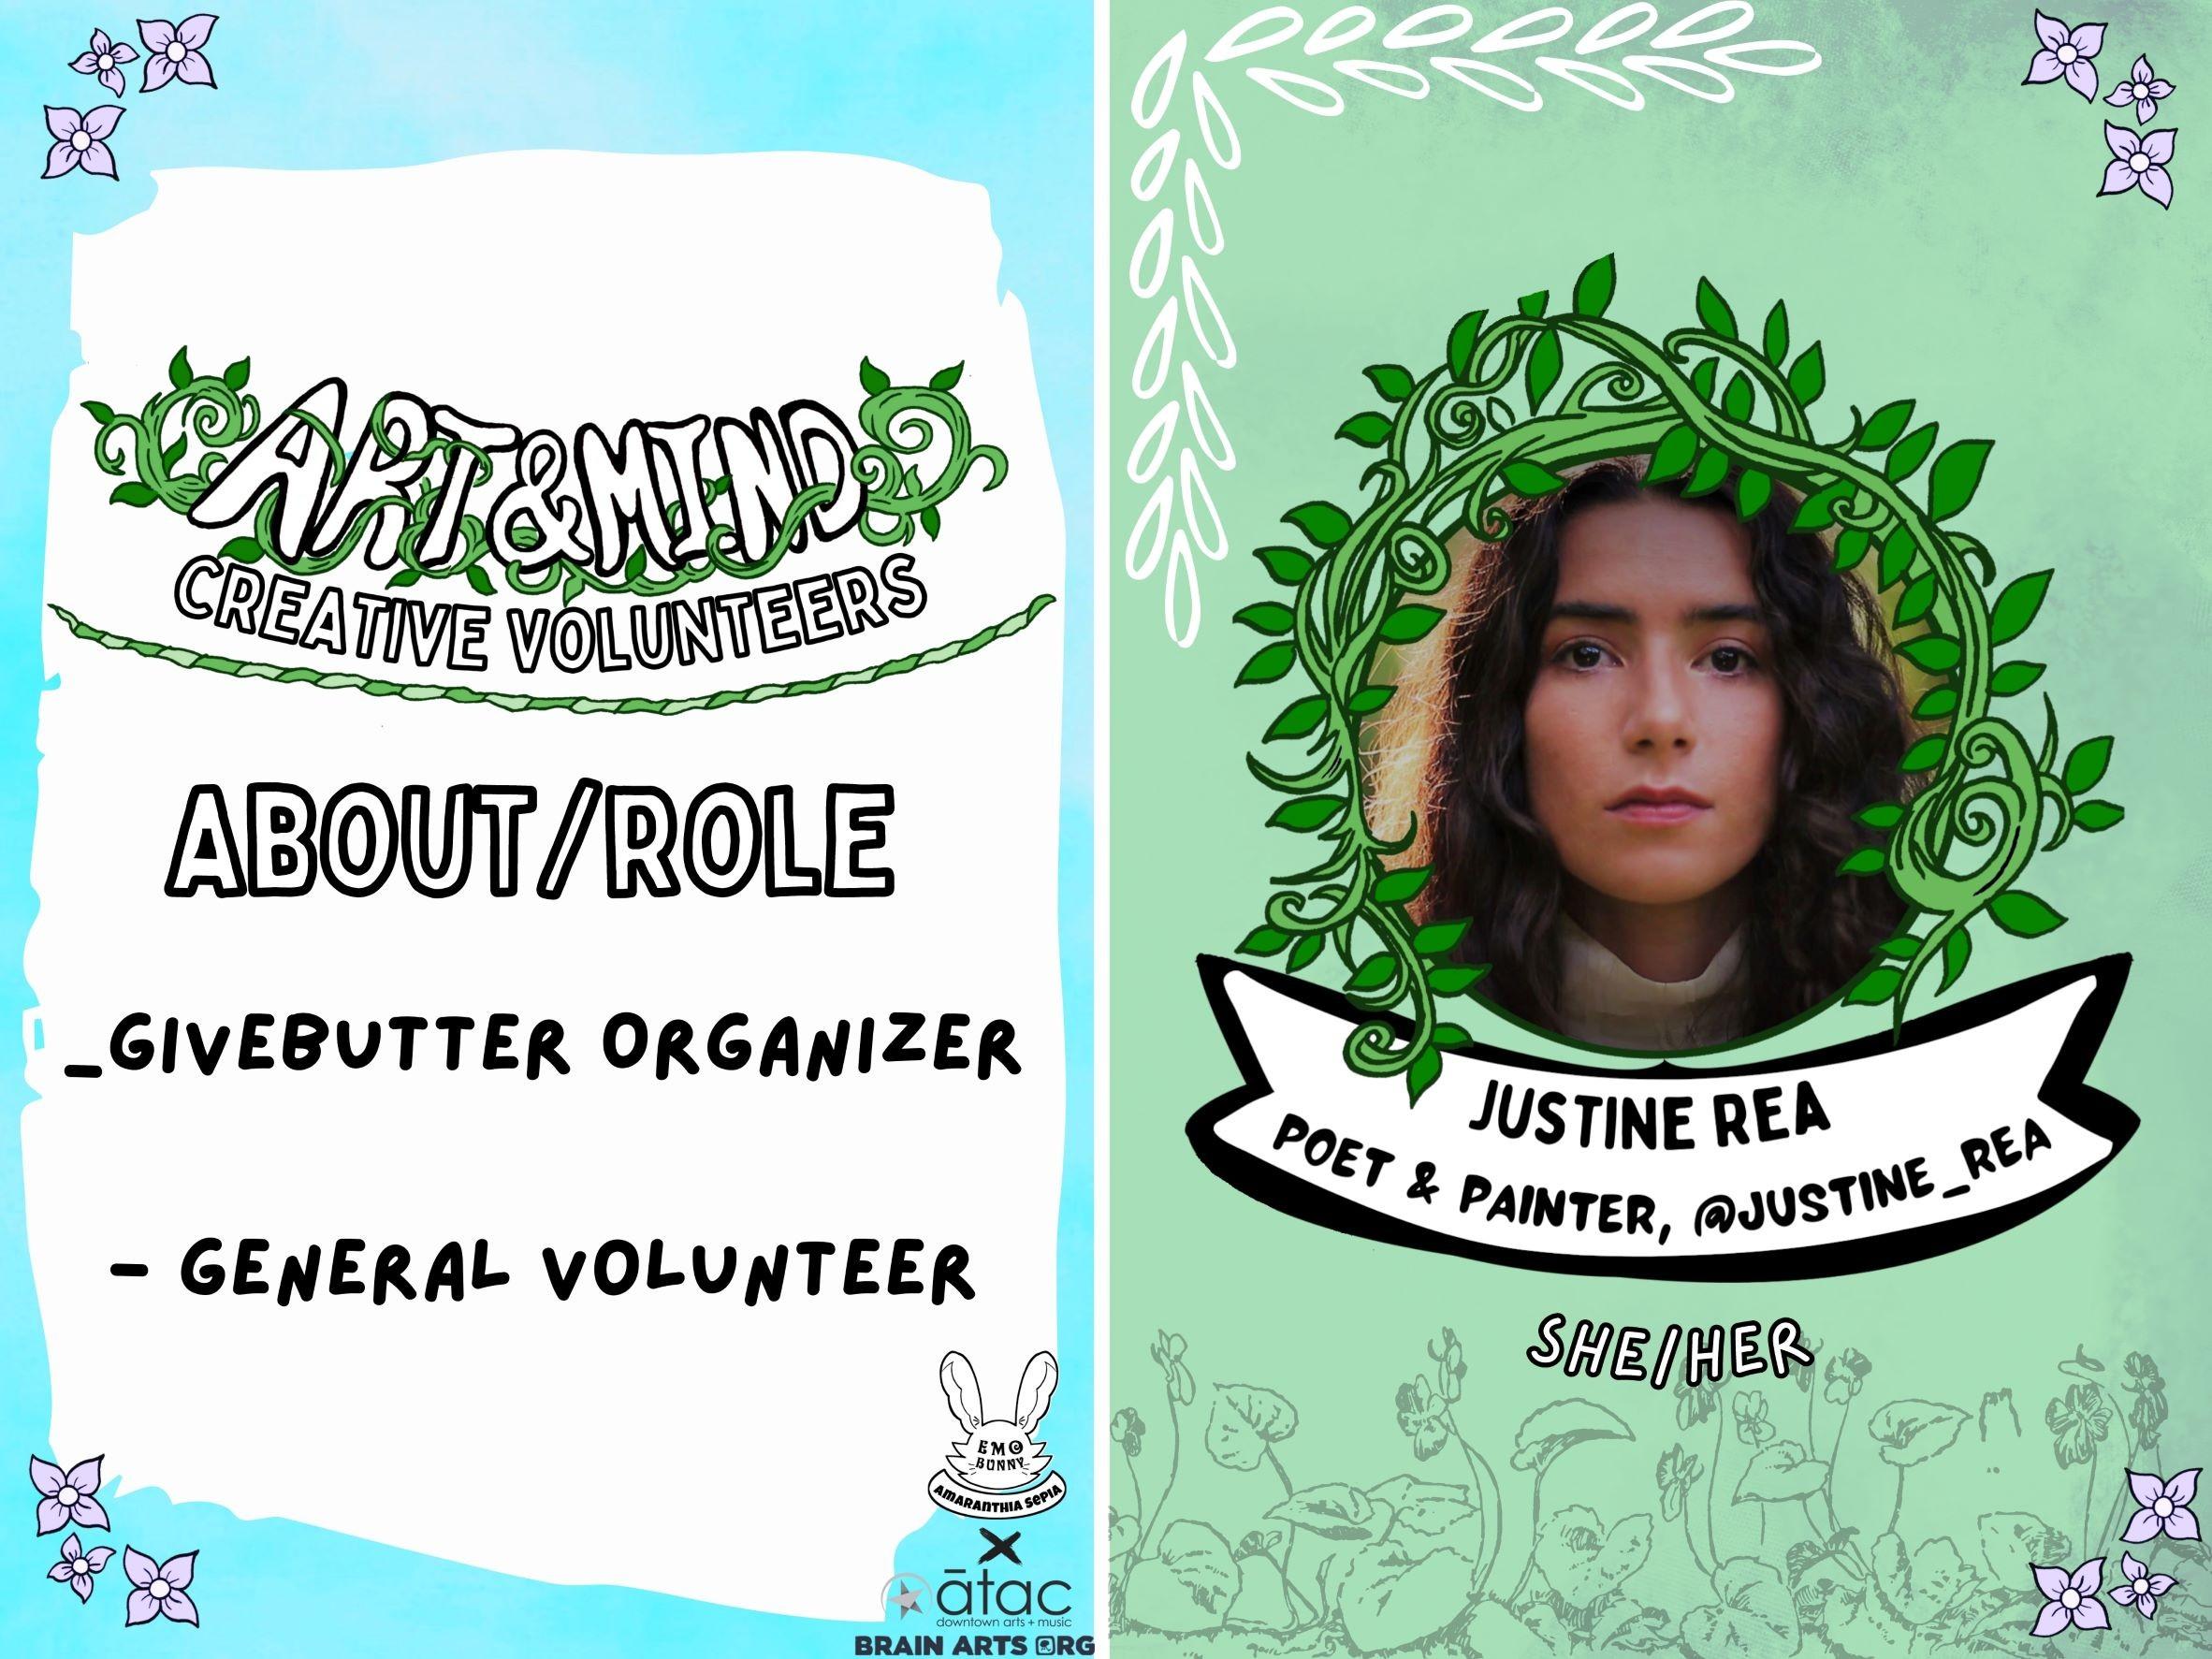 Creative Volunteer: GiveButter Organizer and General volunteer @Justine_rea